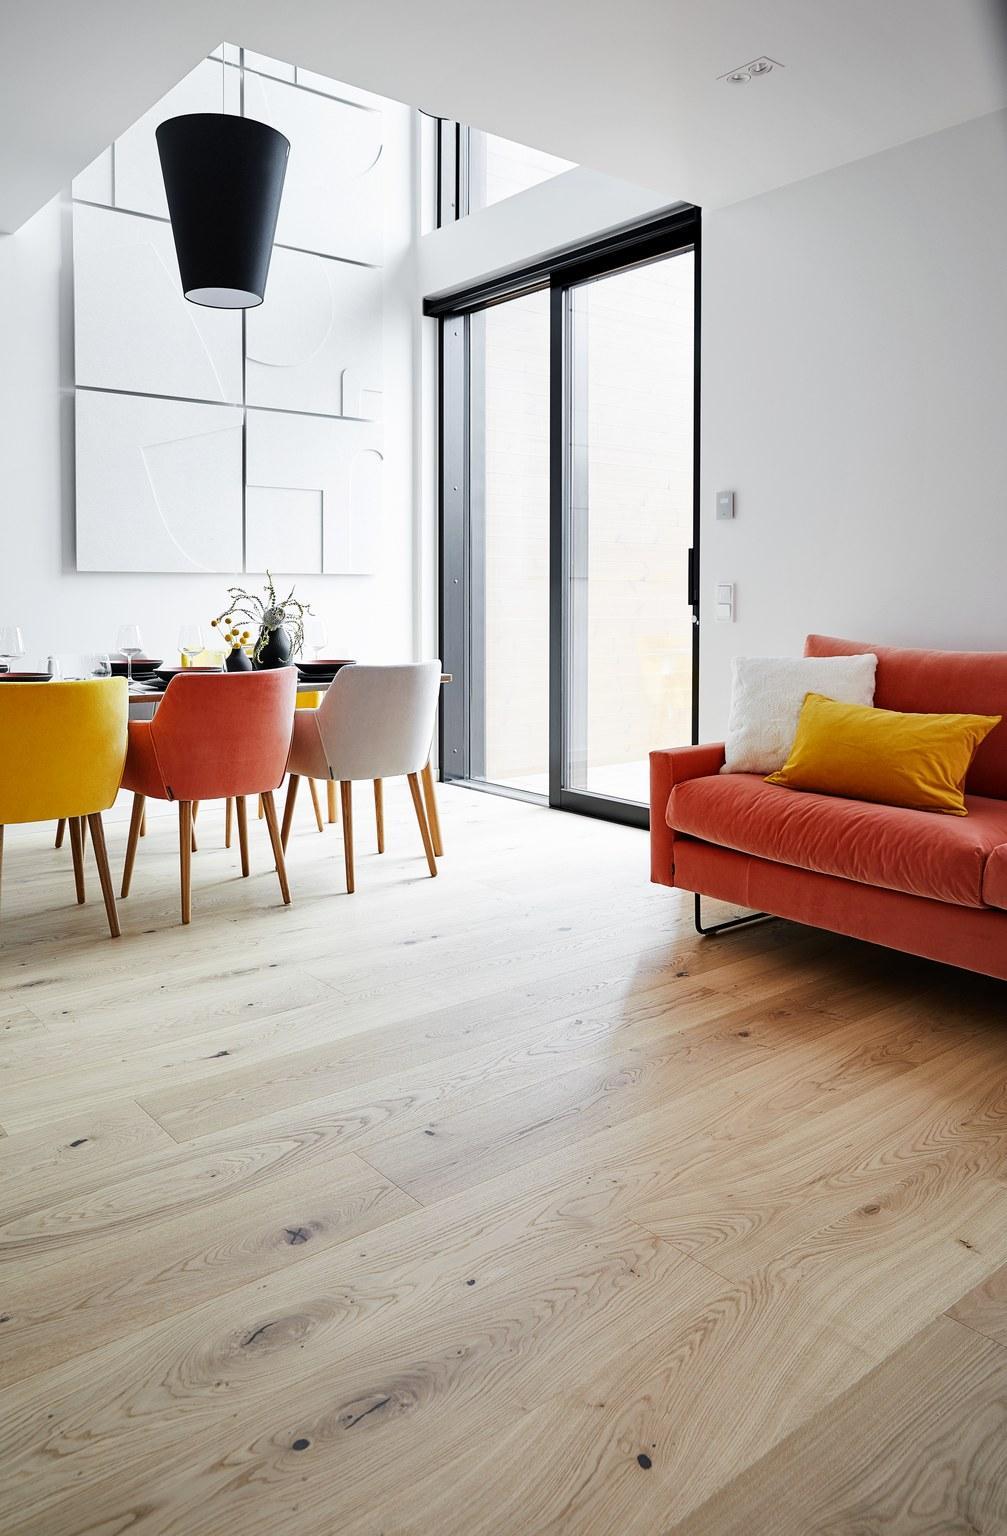 Timberwise parketti puulattia wooden floor parquet Tammi Oak Nordic